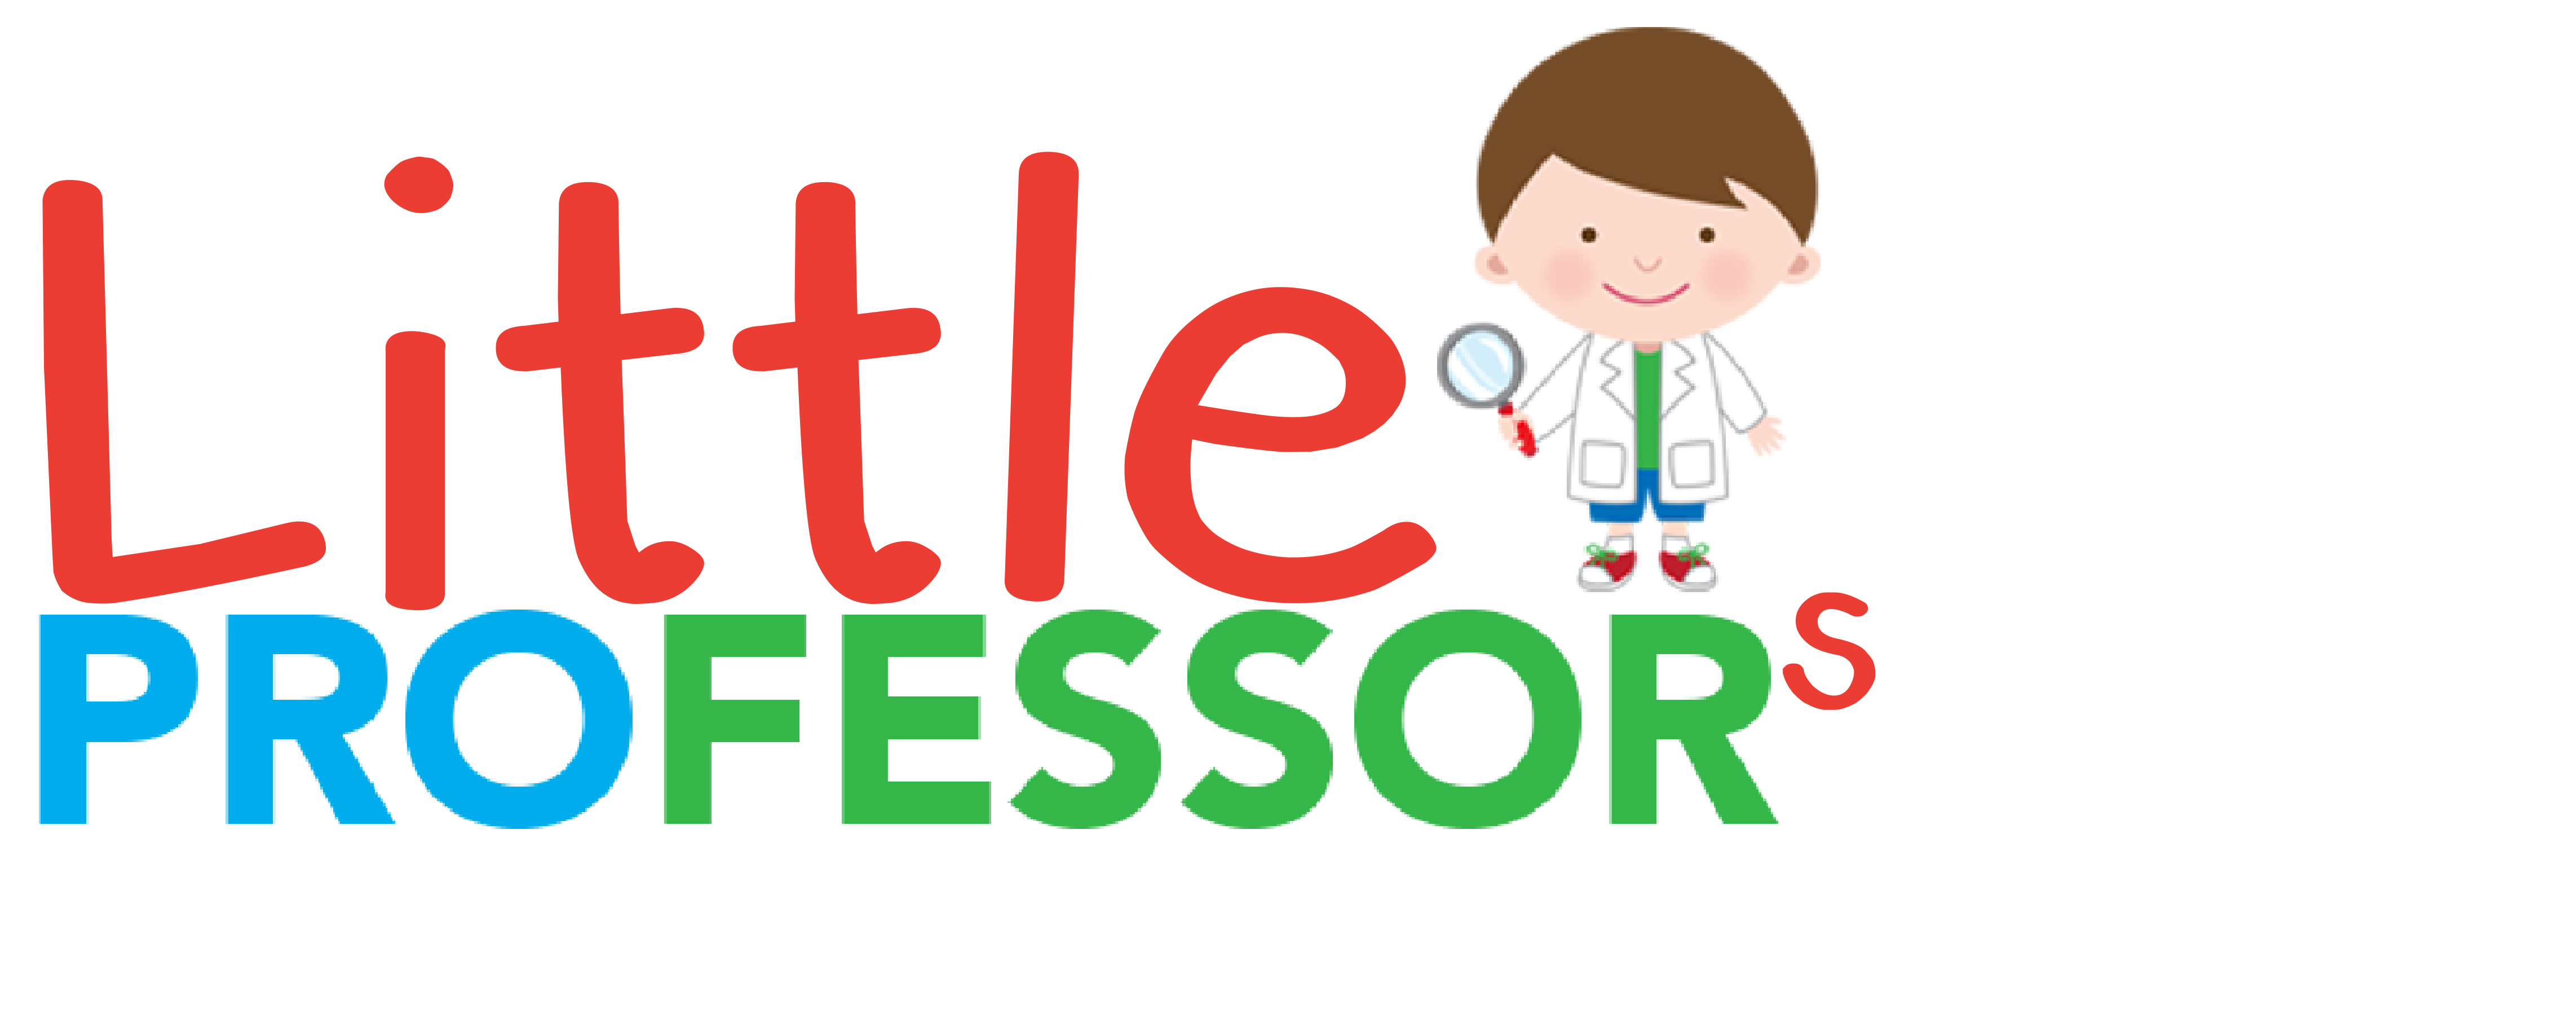 Little professors steam classes. Report clipart experiment result